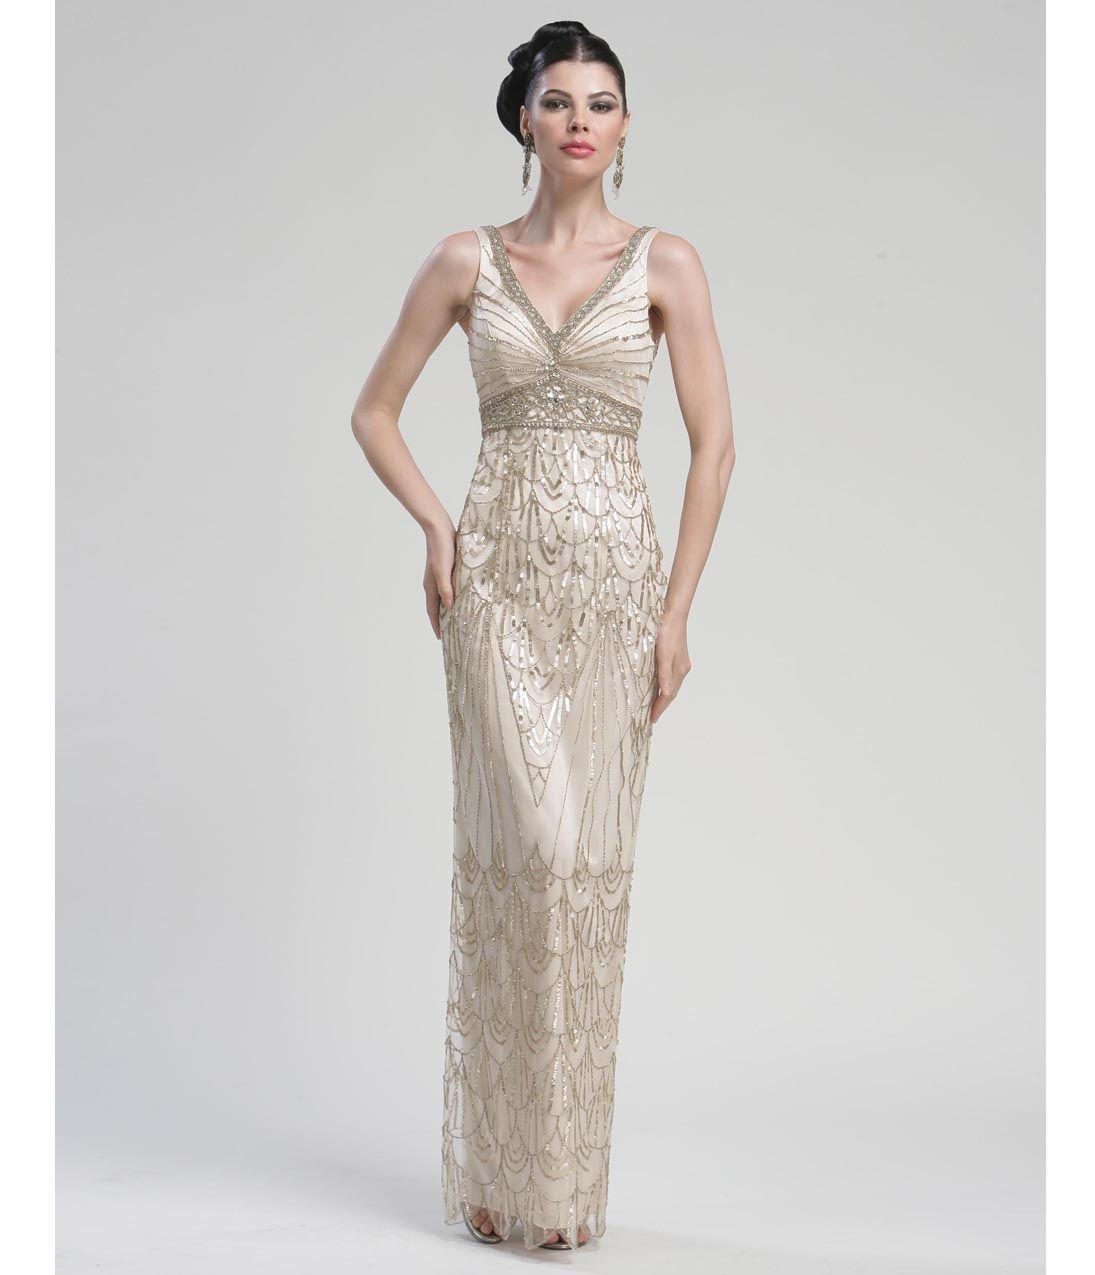 Long Champagne Sequined Tank Gown - Unique Vintage - Cocktail ...